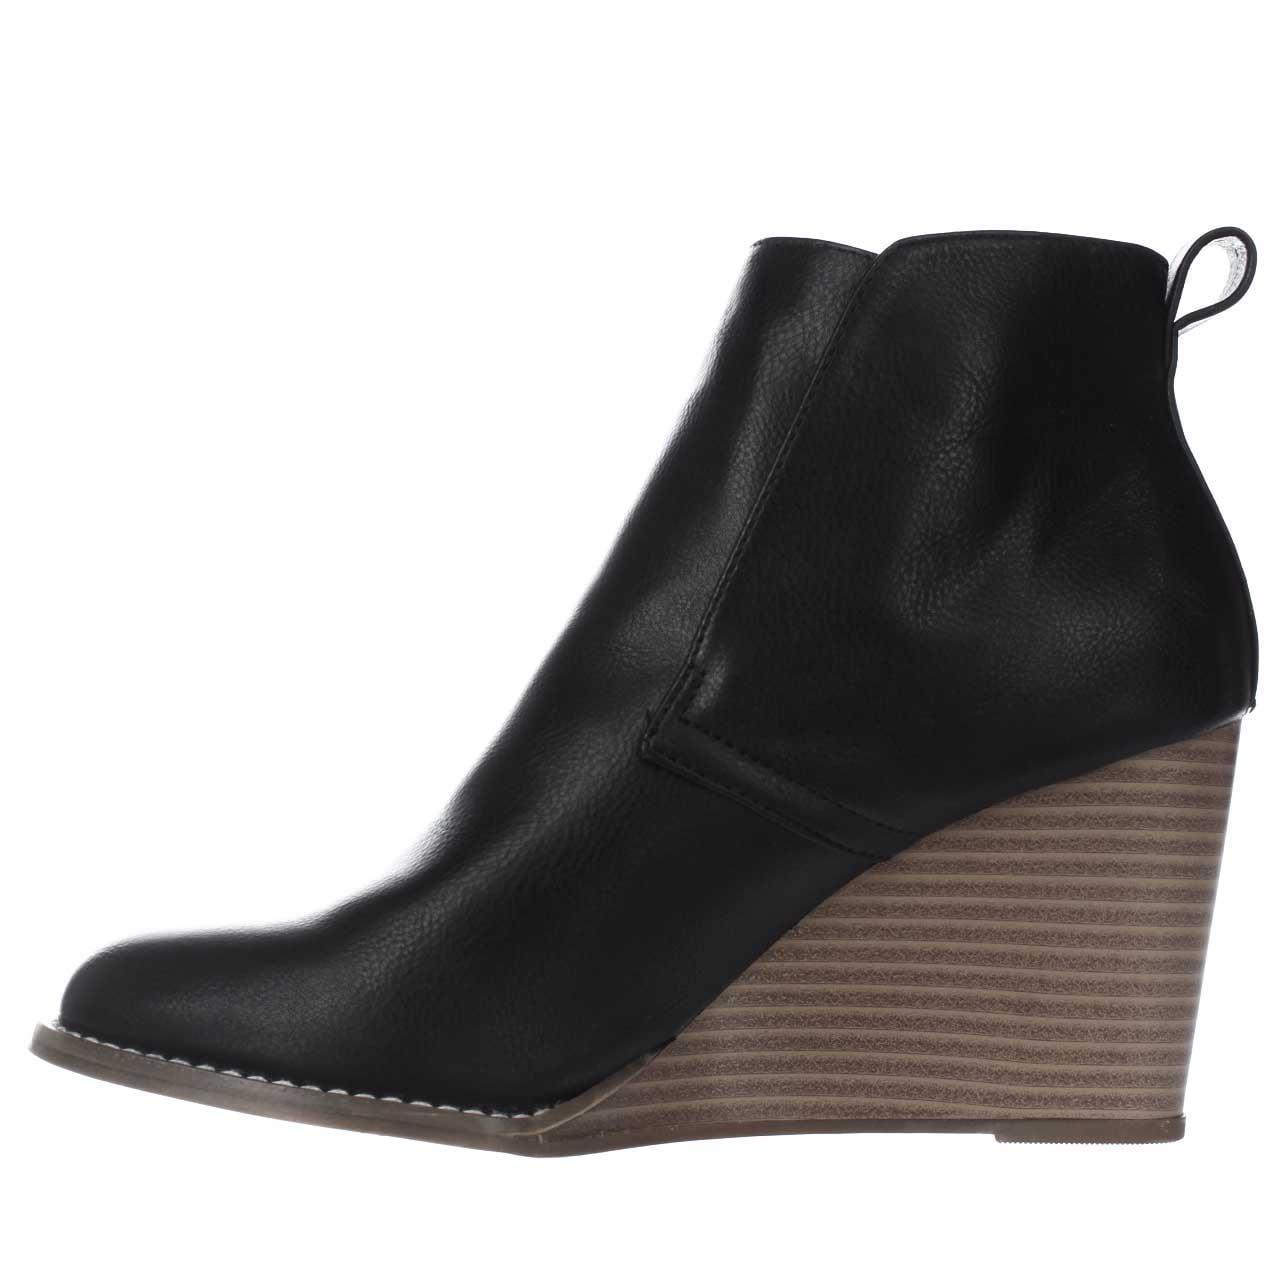 958578e91ab Shop Nautica Calyan Wedge Ankle Boots